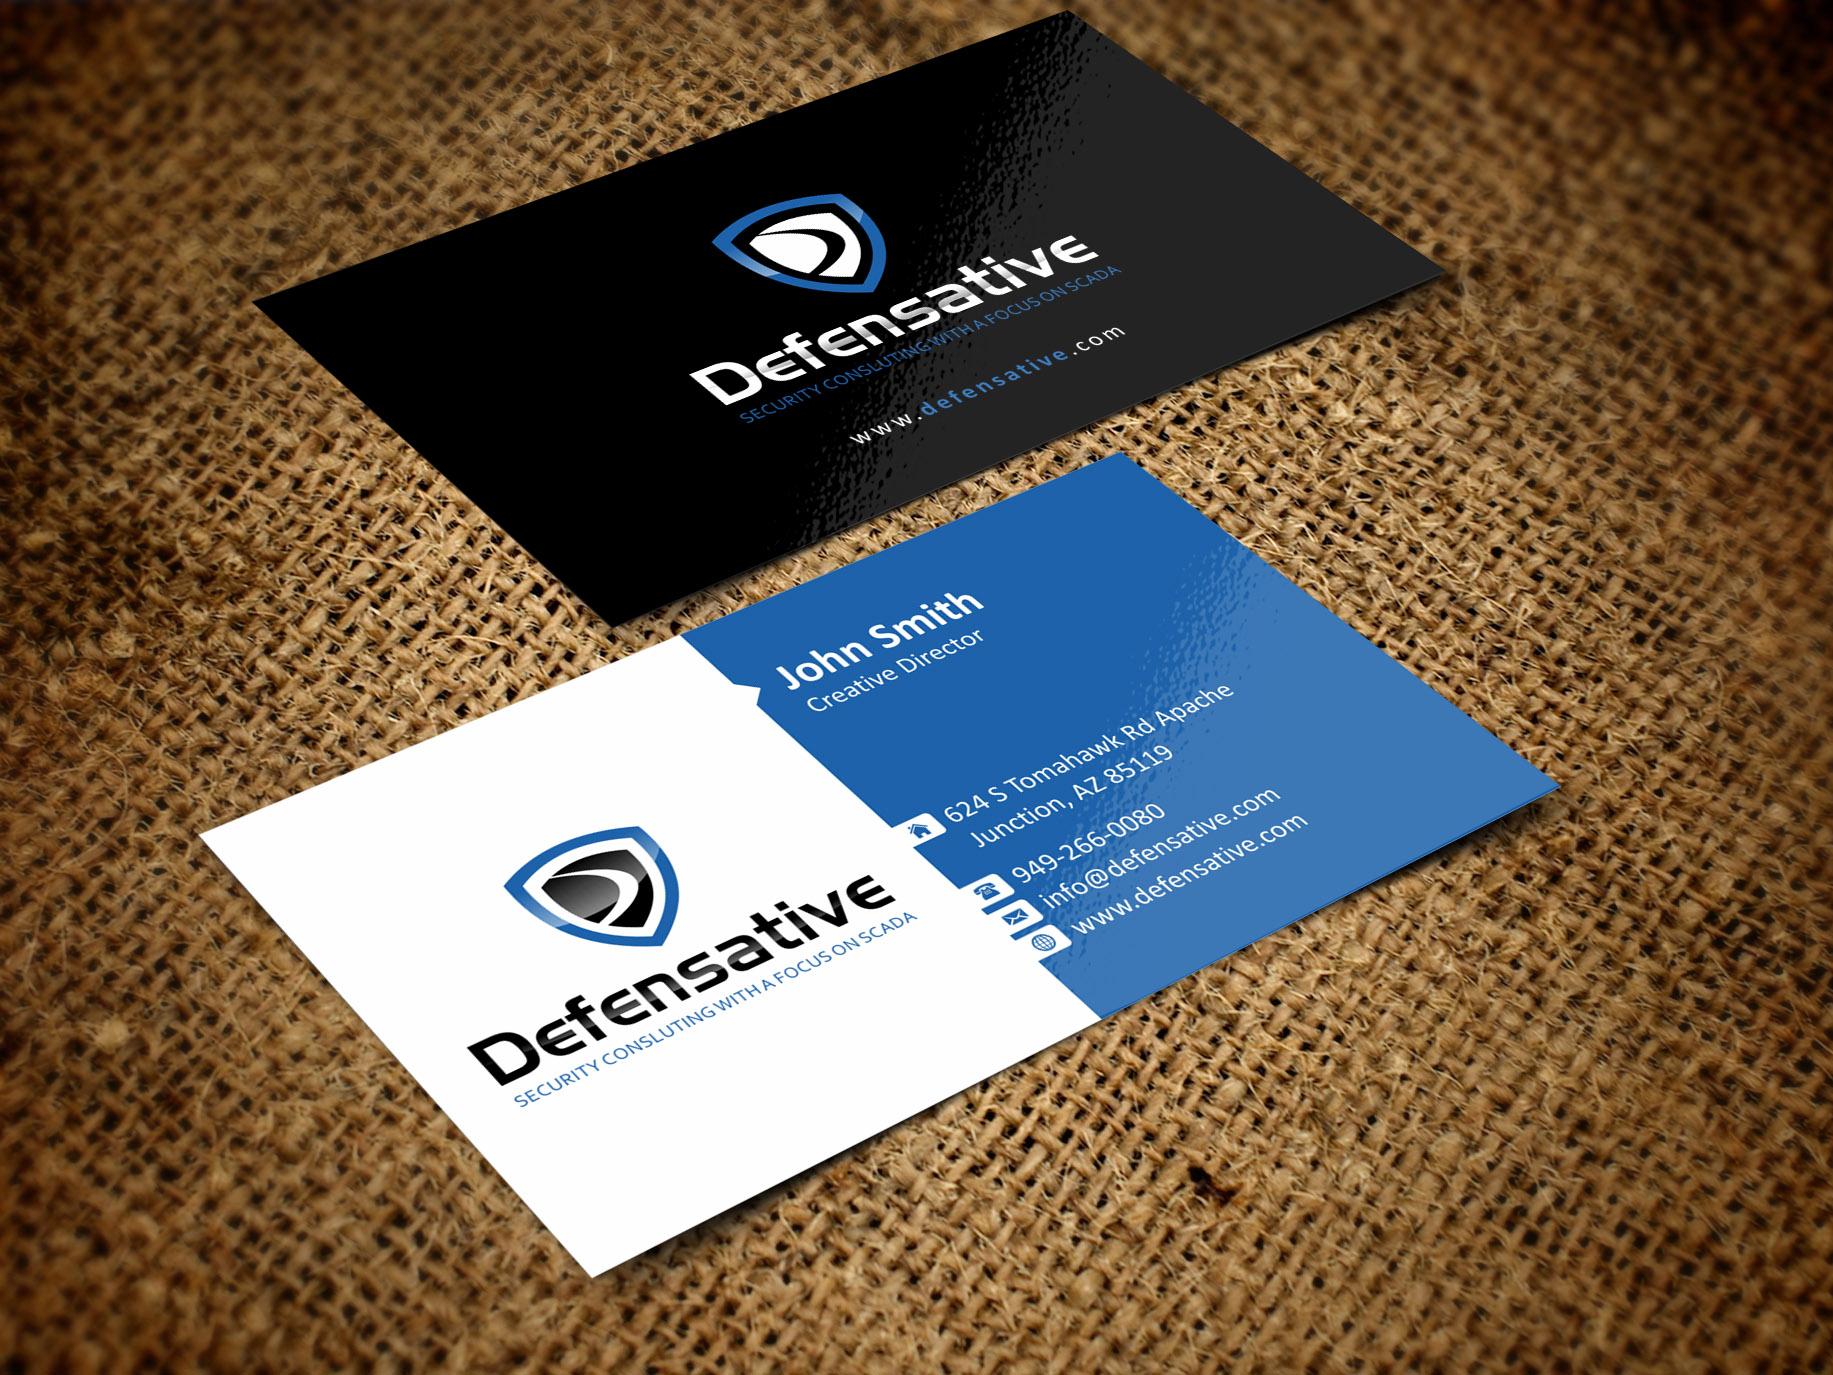 Custom Design by Muhammad Aslam - Entry No. 24 in the Custom Design Contest Custom Design Business Cards+Logo+Stationary for Defensative.